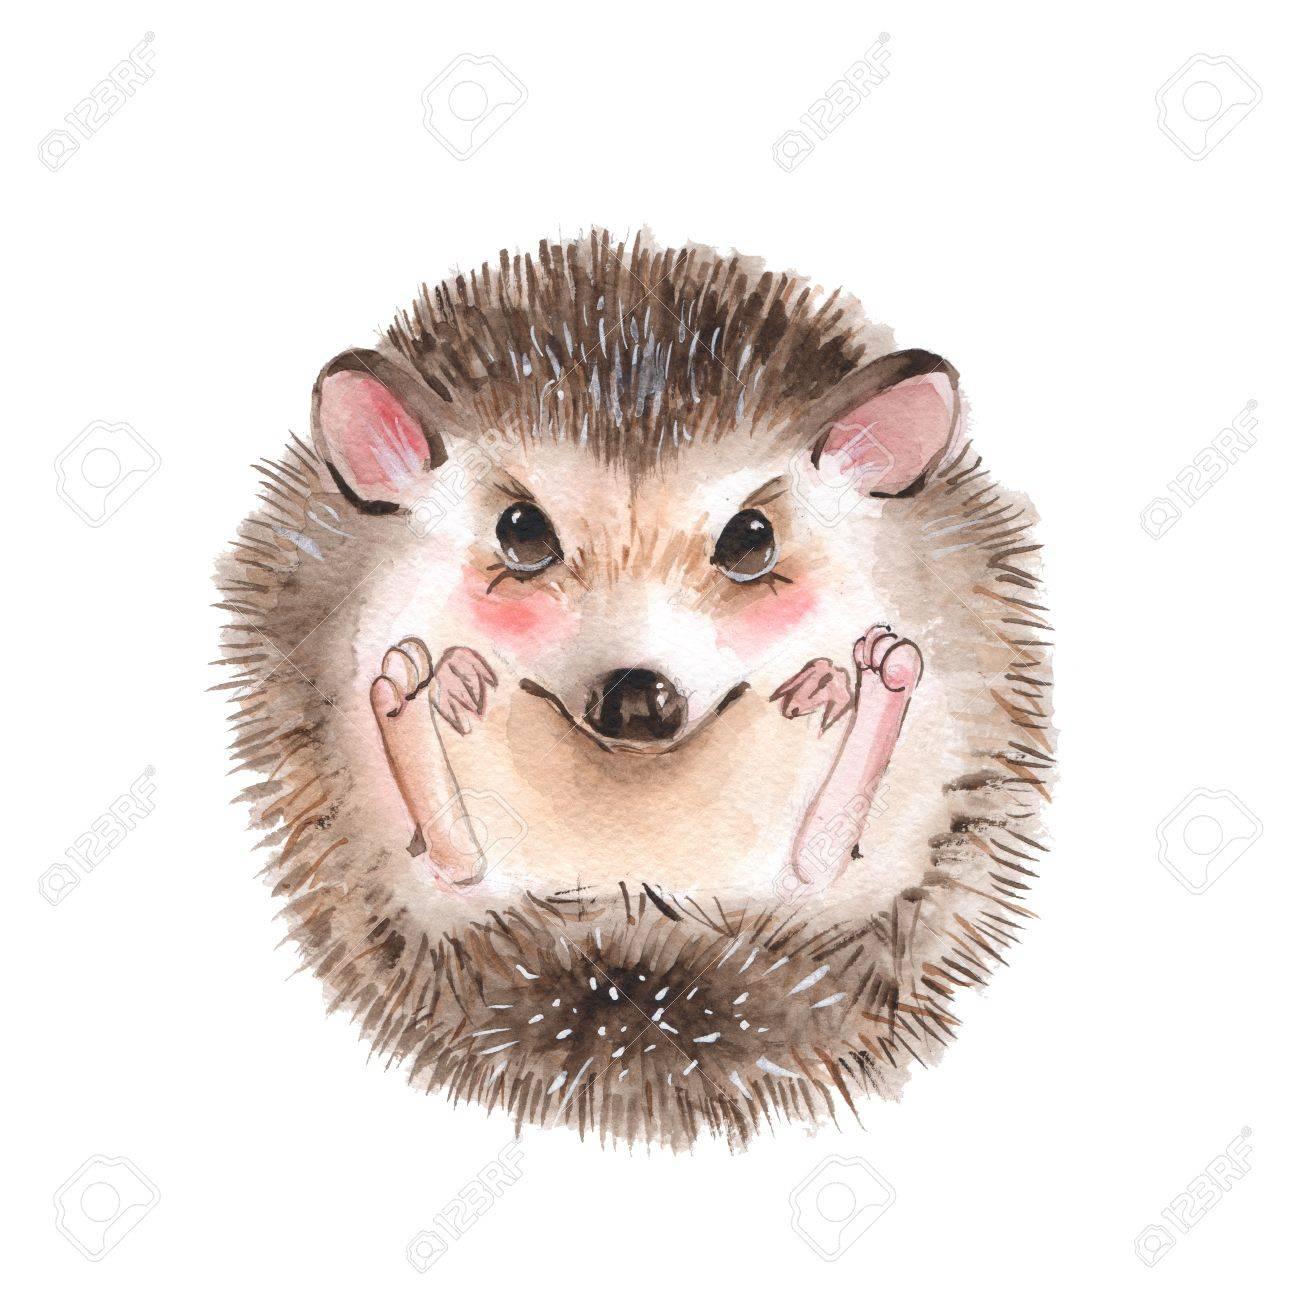 Cute hedgehog. Cartoon watercolor illustration - 76129487